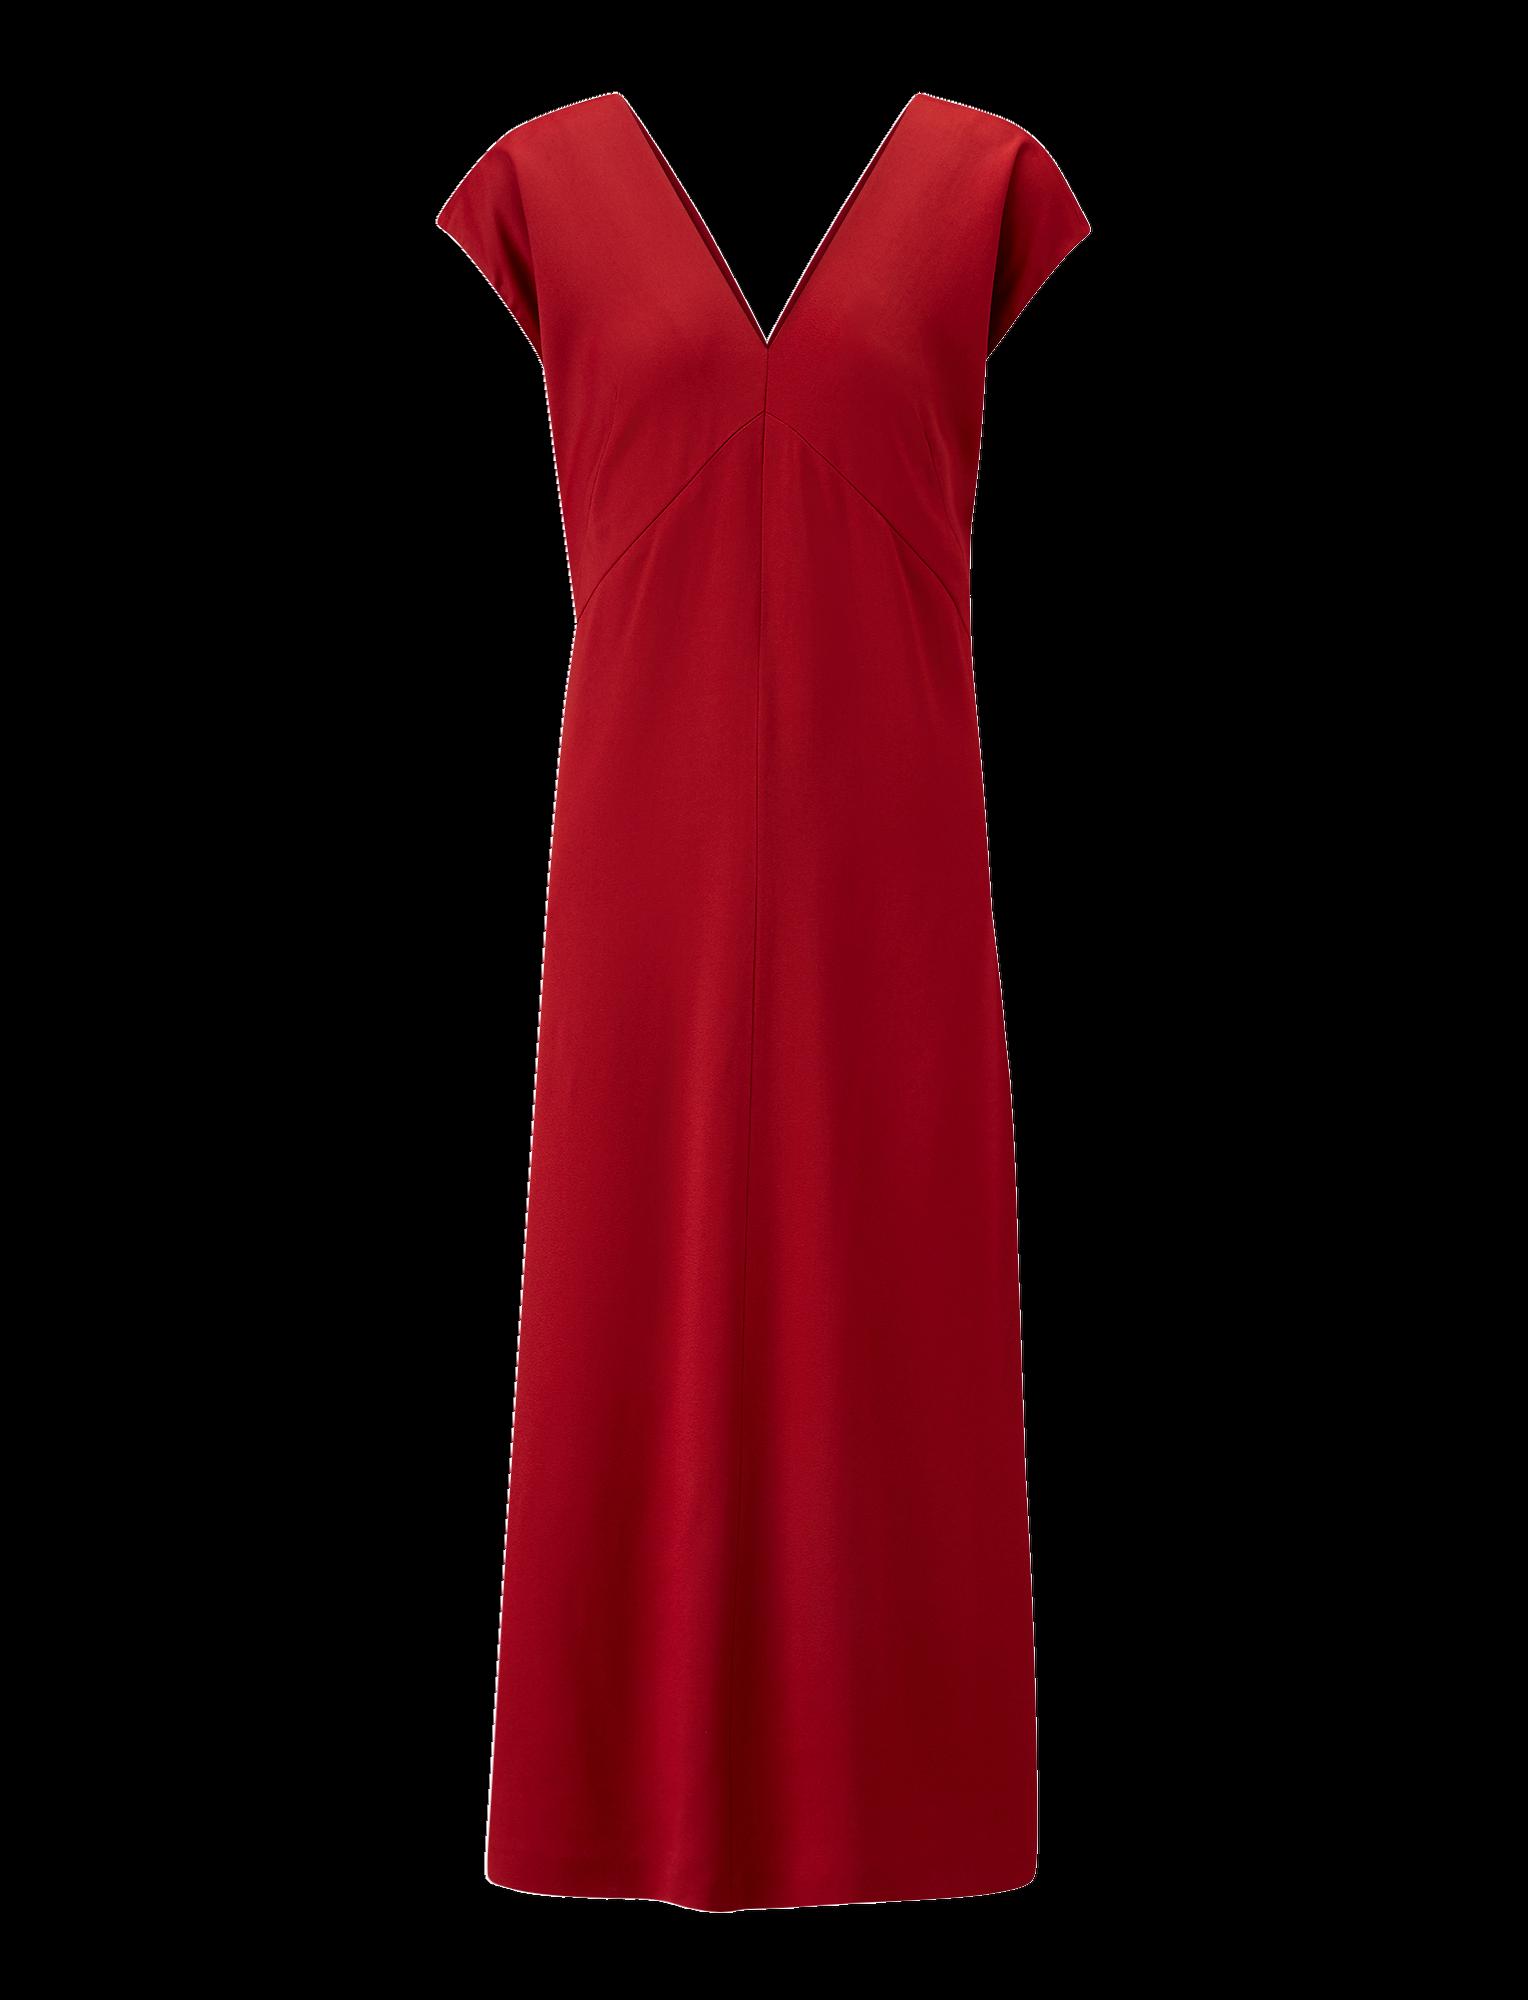 Joseph, Sienna Light Cady Dress, in RUBY